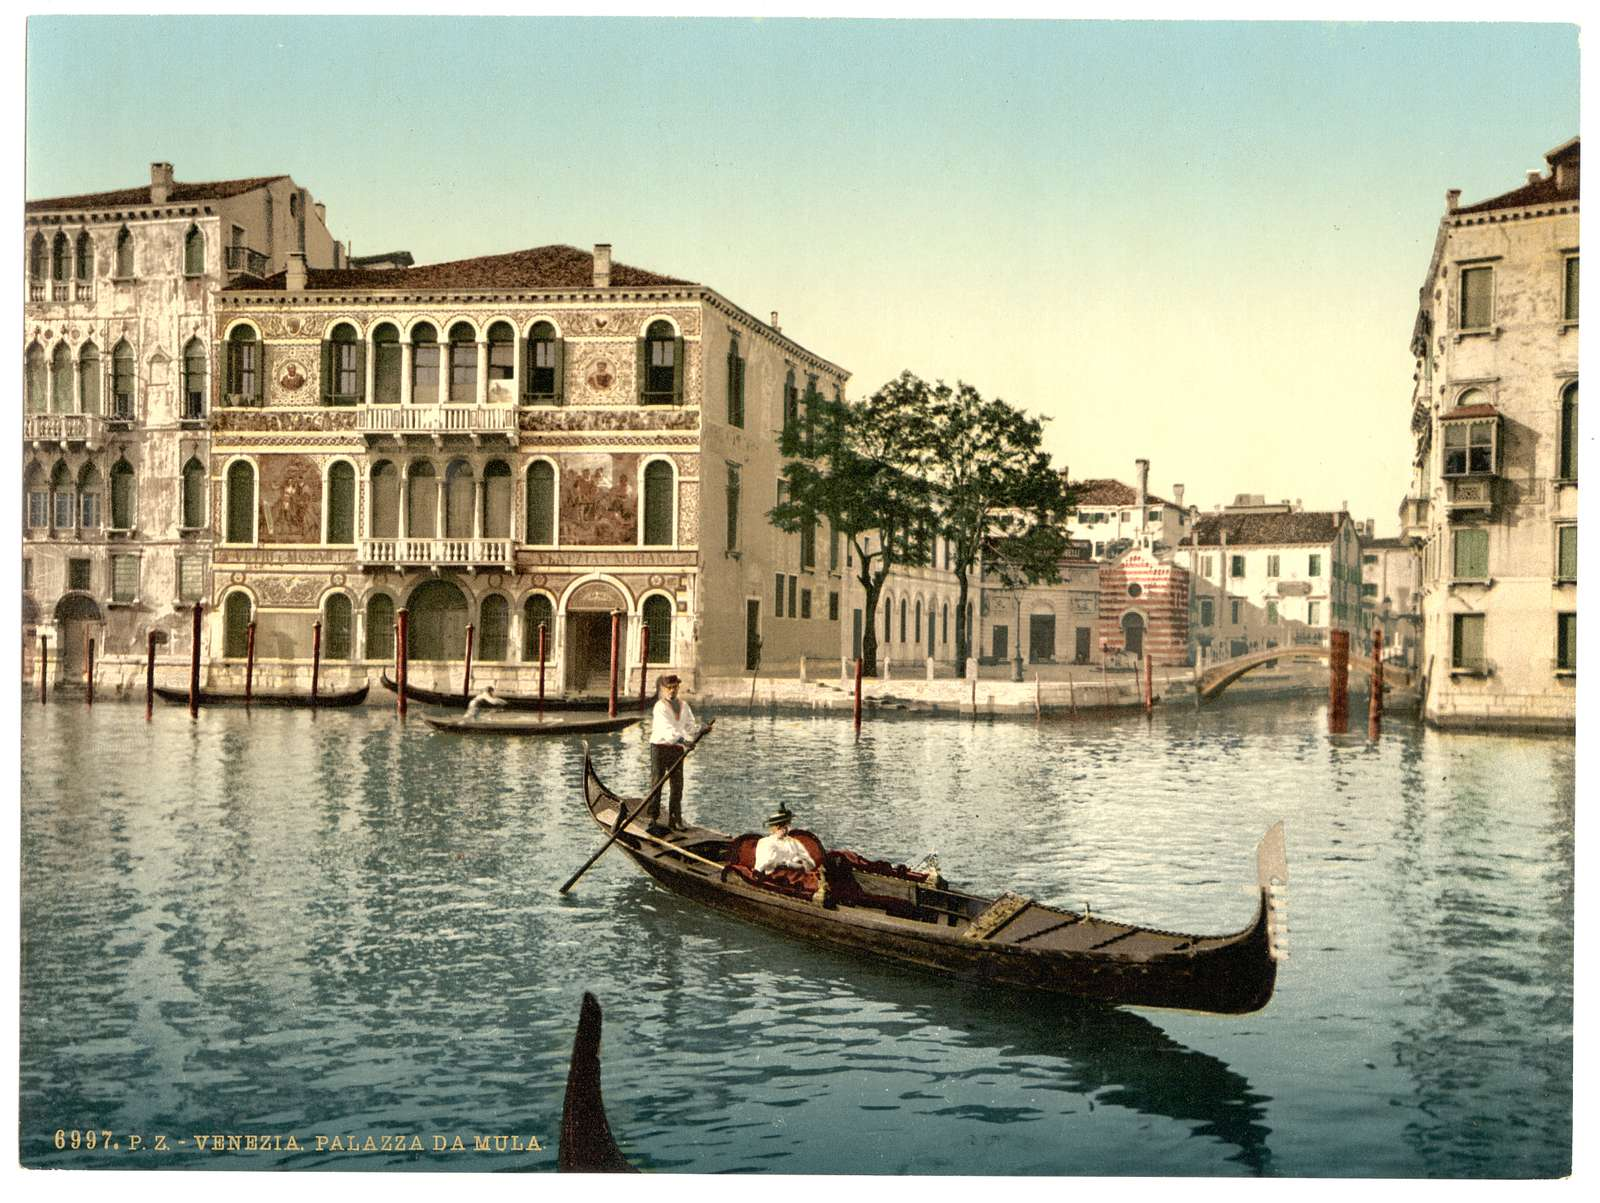 [Da Mulla Palace, Venice, Italy]